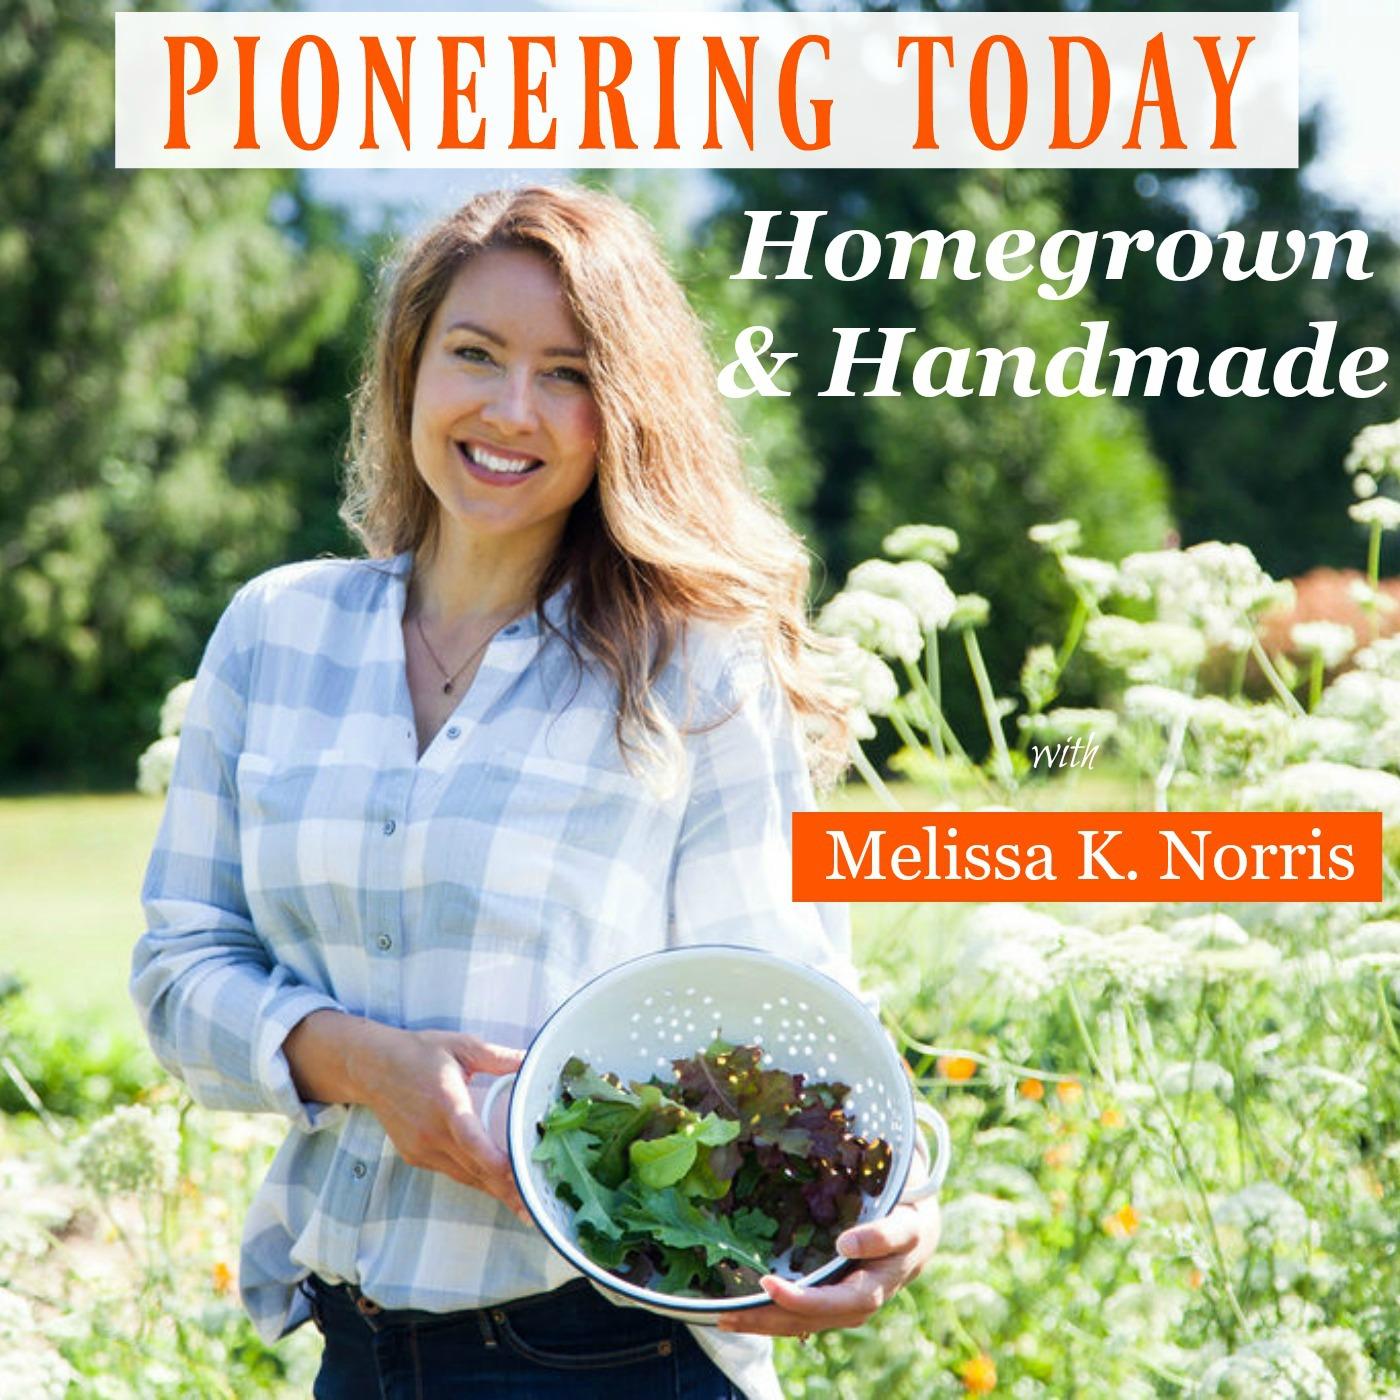 Pioneering Today with Melissa K. Norris show art